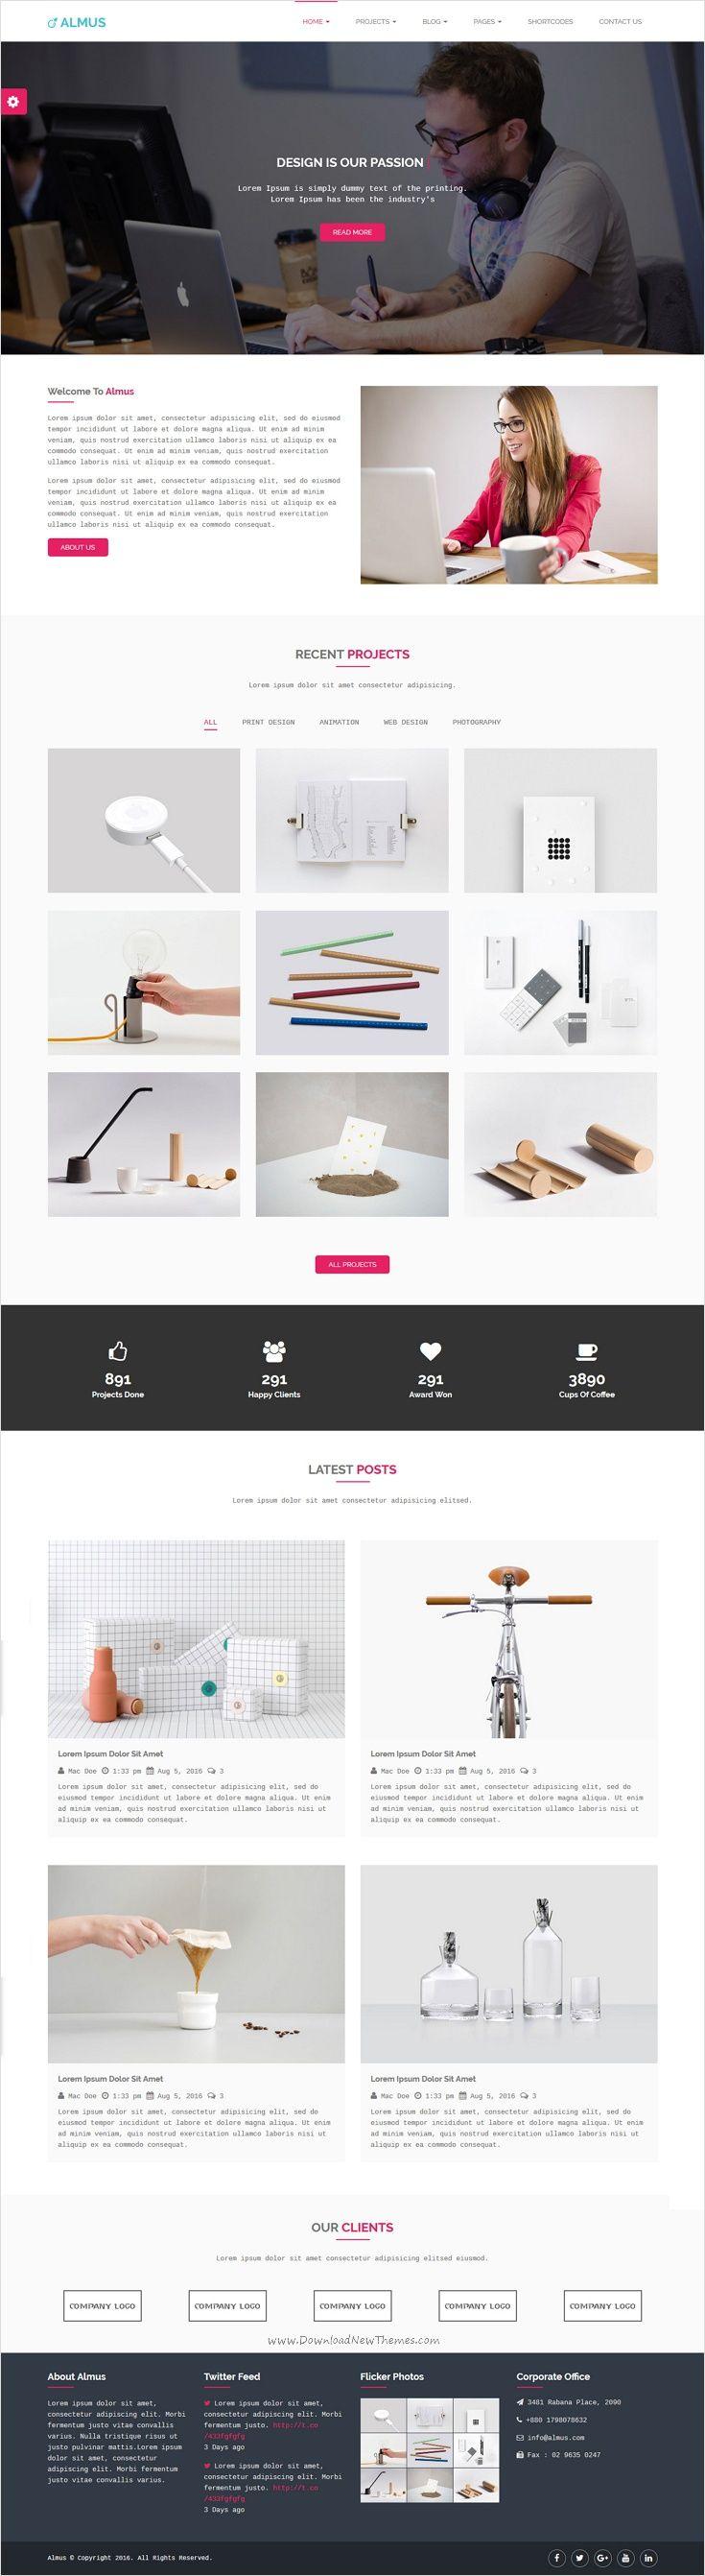 30 best profile images on Pinterest   Bewerbung design, Lebenslauf ...